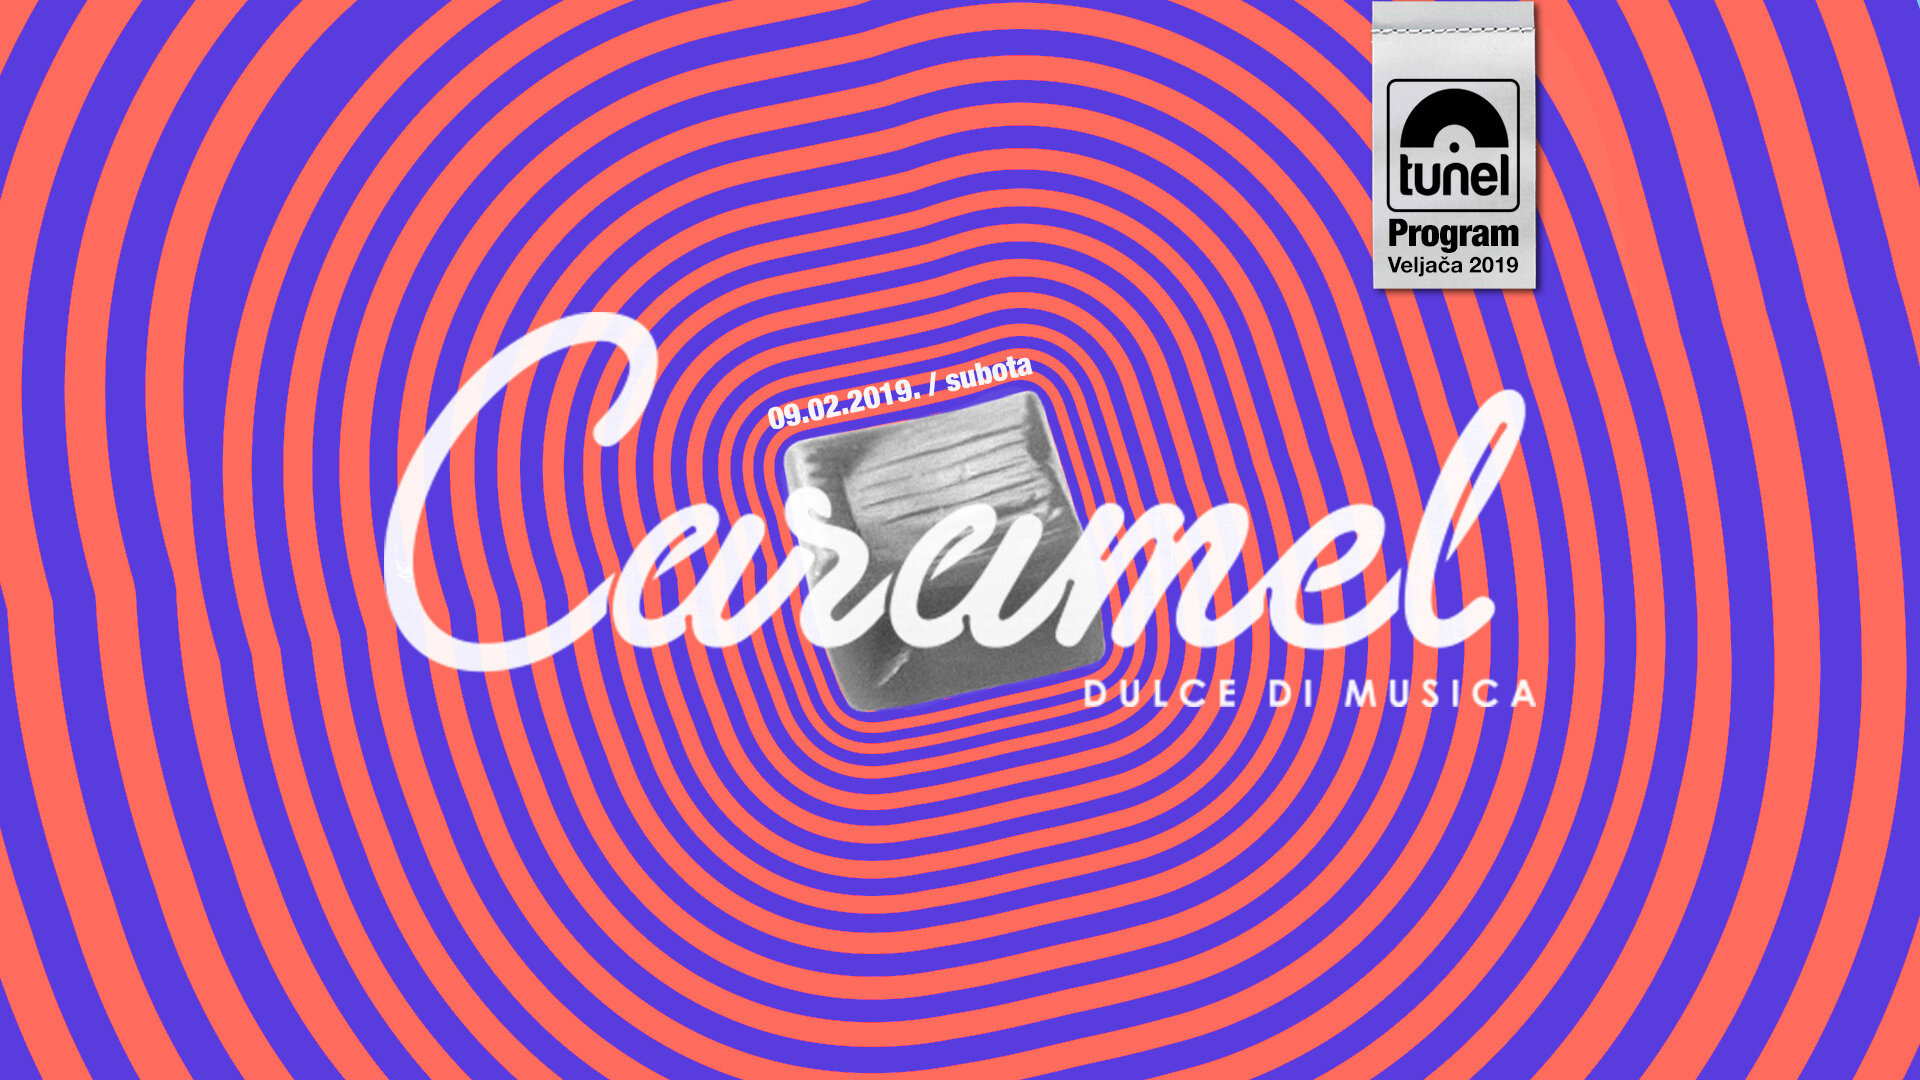 tunel-caramel-9-2.jpg